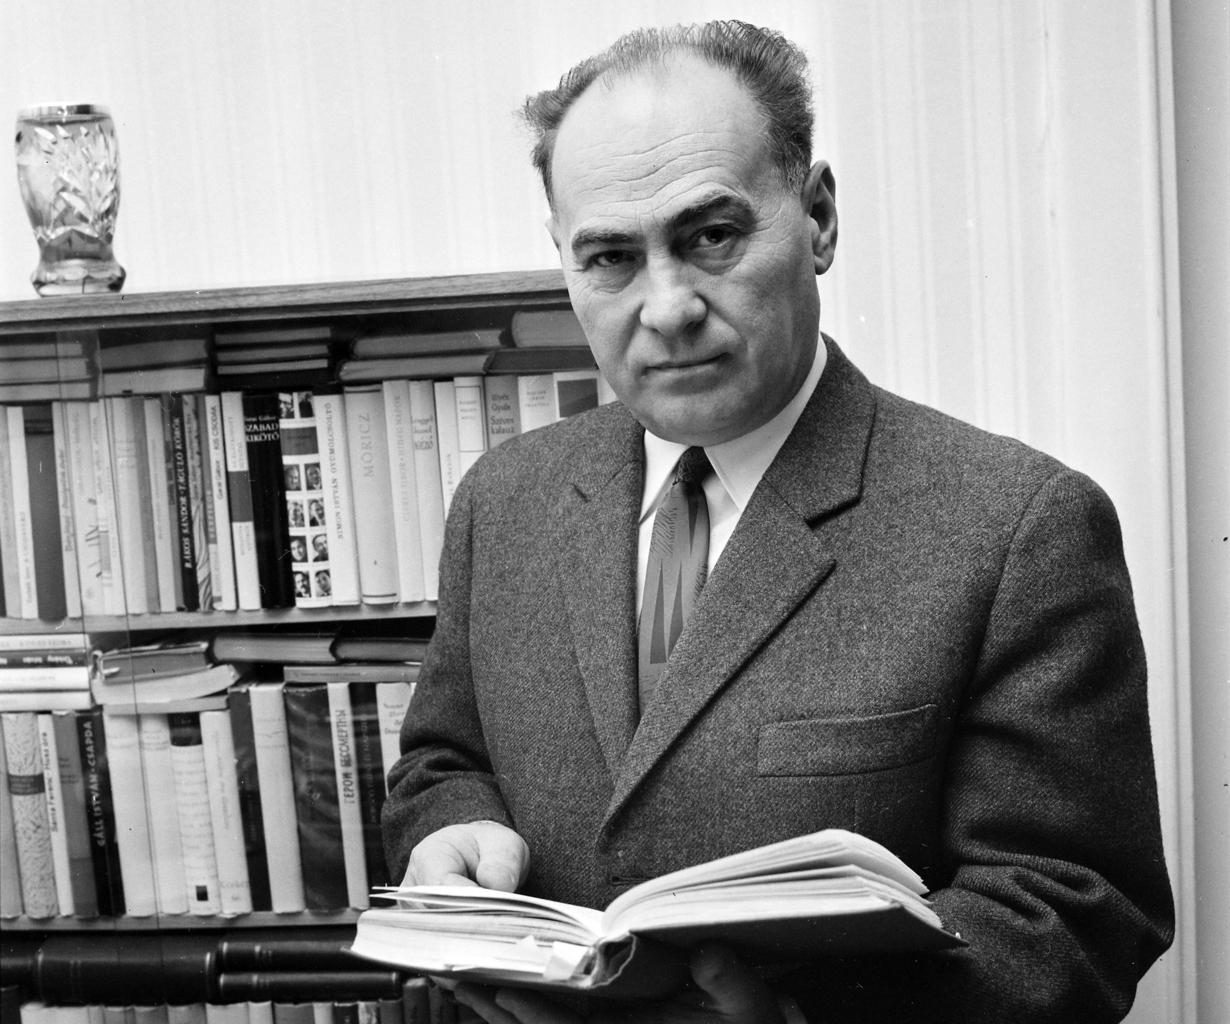 Dobozy Imre 1968-ban #moszkvater